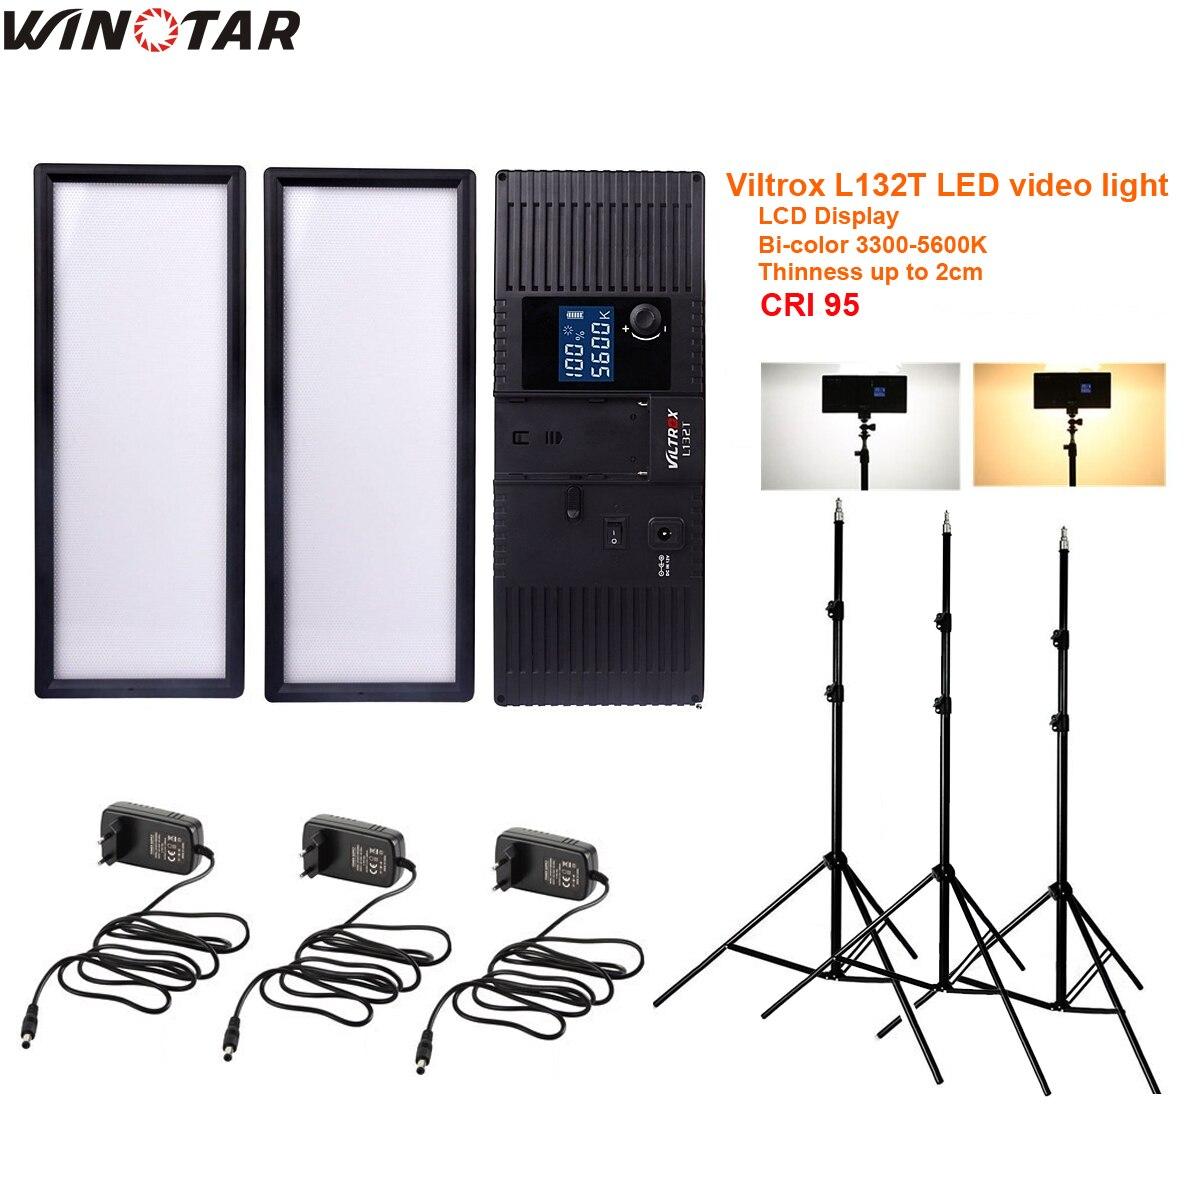 3x Viltrox L132T Bi-Color Dimmable LED Video Light + Light Stand + AC Adapter for DSLR Camera Studio LED Lighting Kit